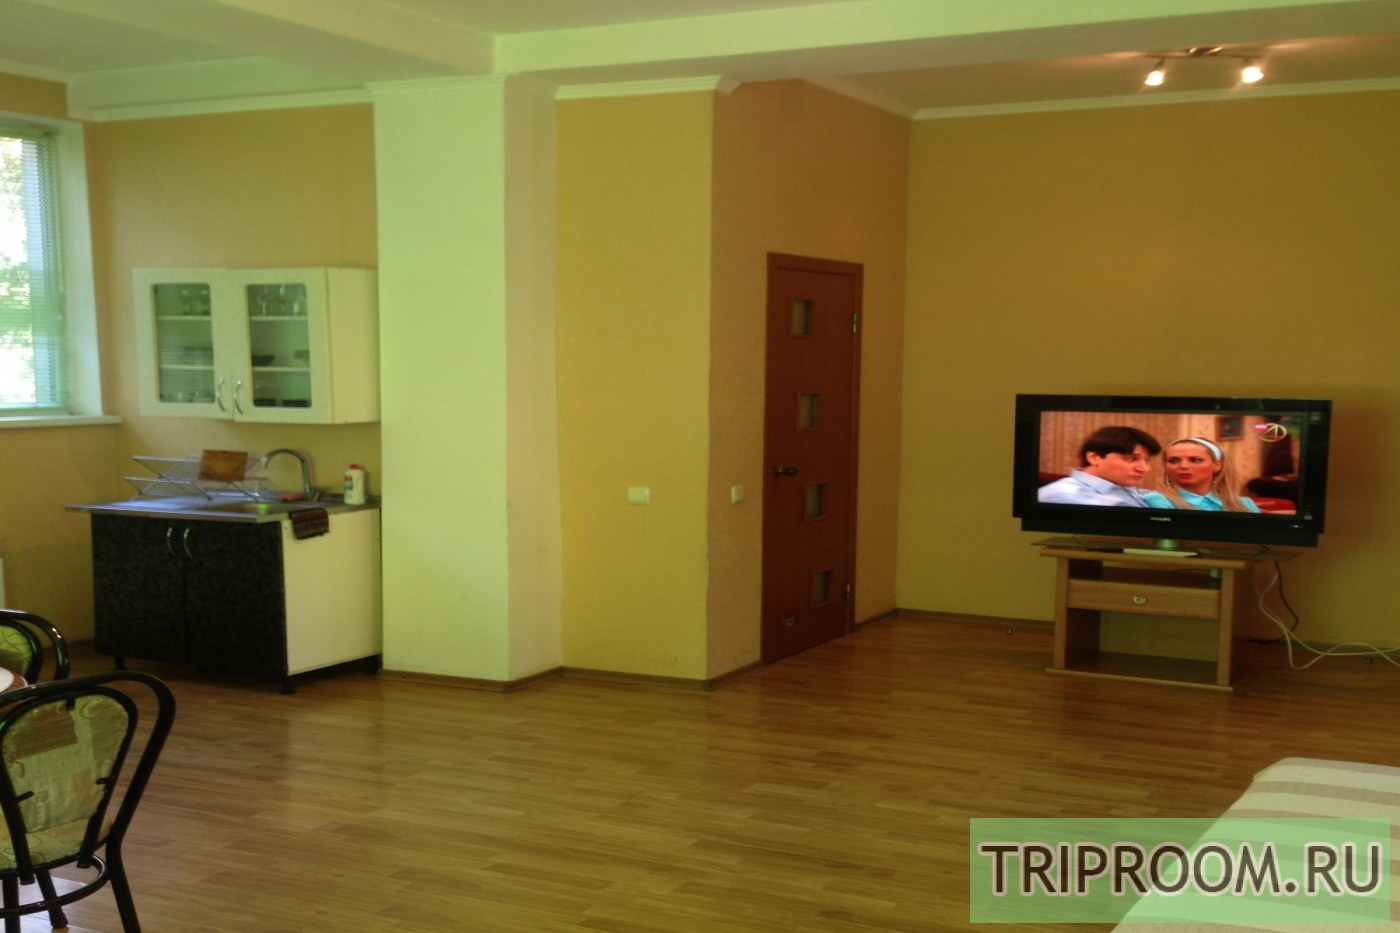 1-комнатная квартира посуточно (вариант № 23289), ул. Кирова улица, фото № 6